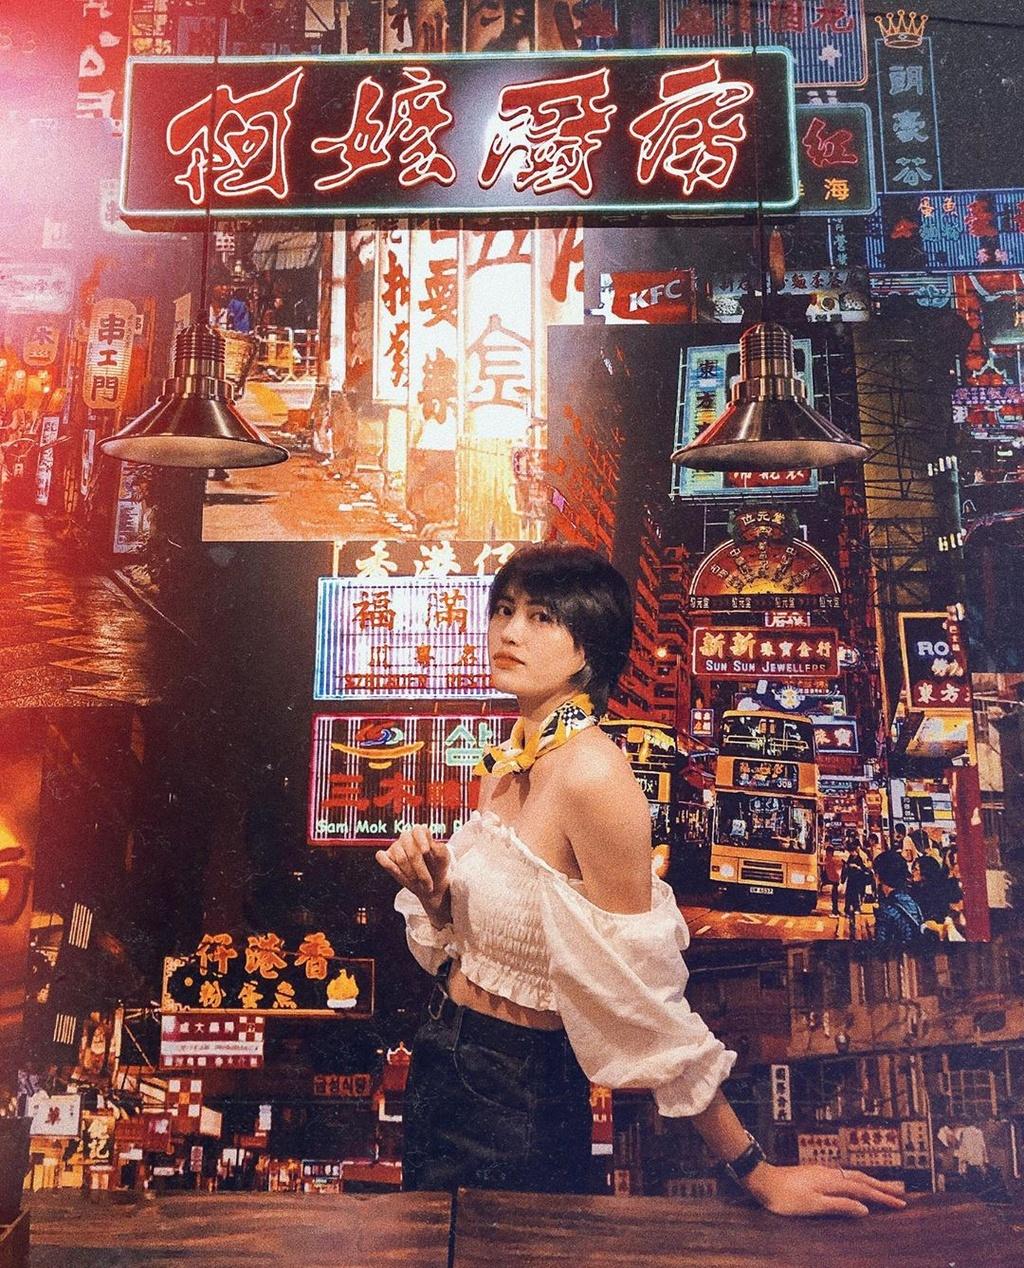 Quan style Hong Kong o TP.HCM anh 11